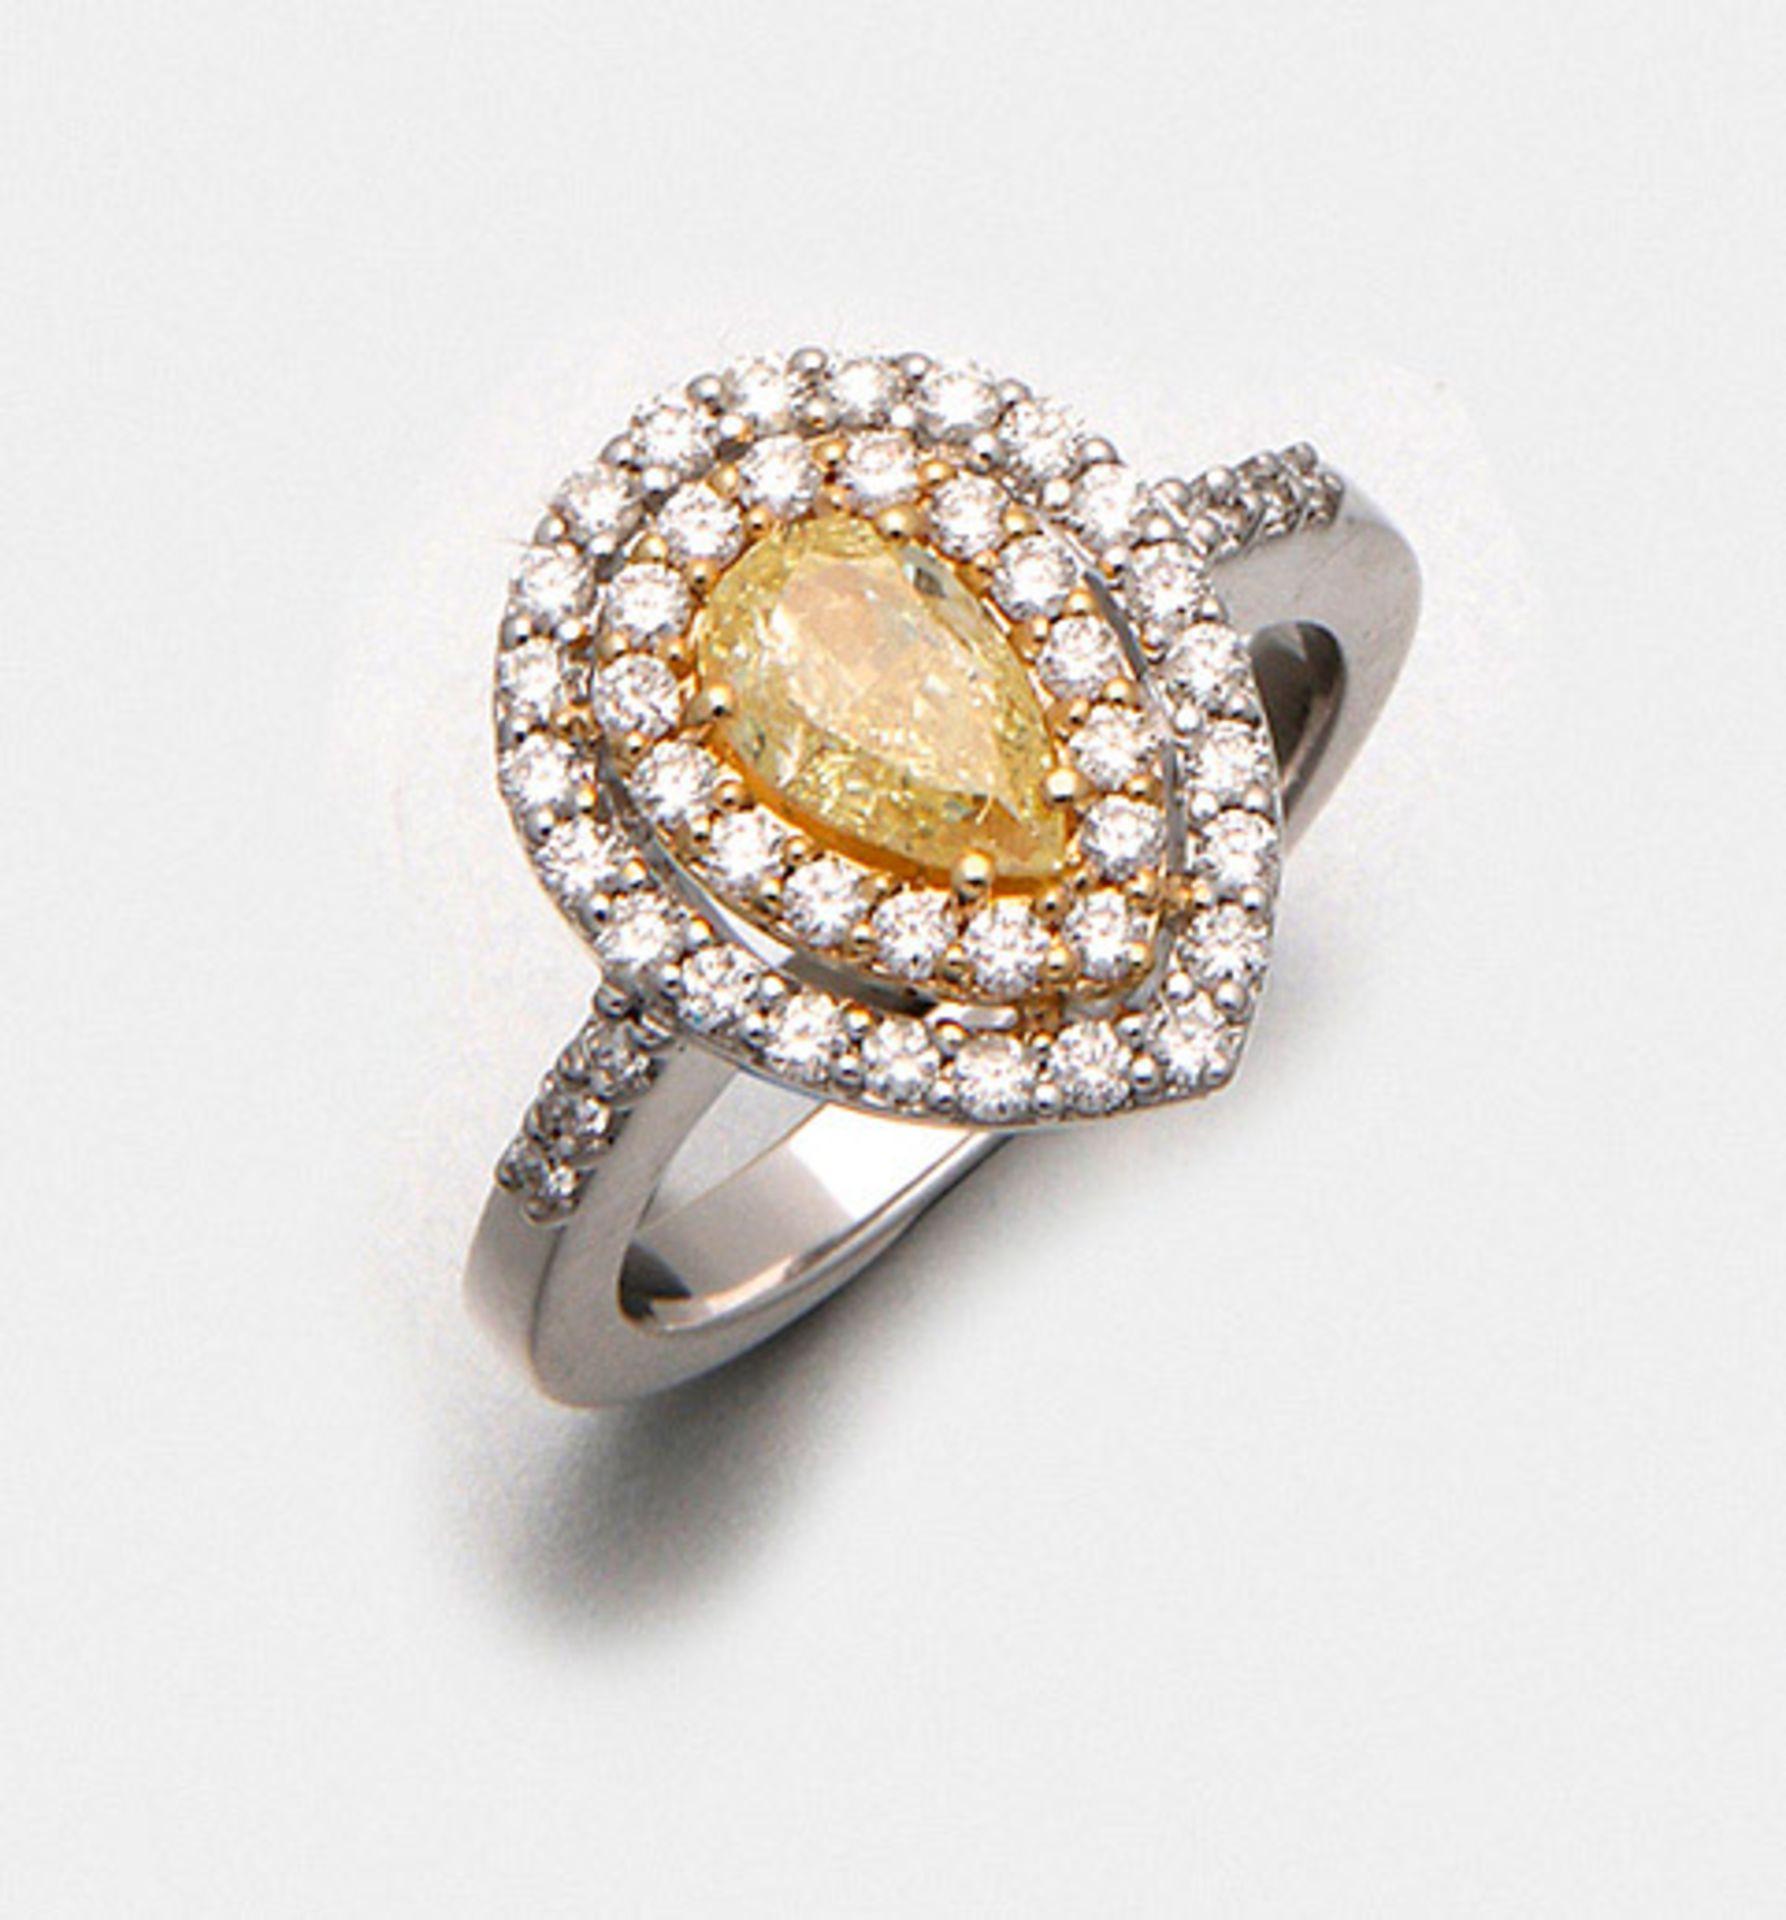 Hochfeiner Natural Fancy-Yellow-Diamantring